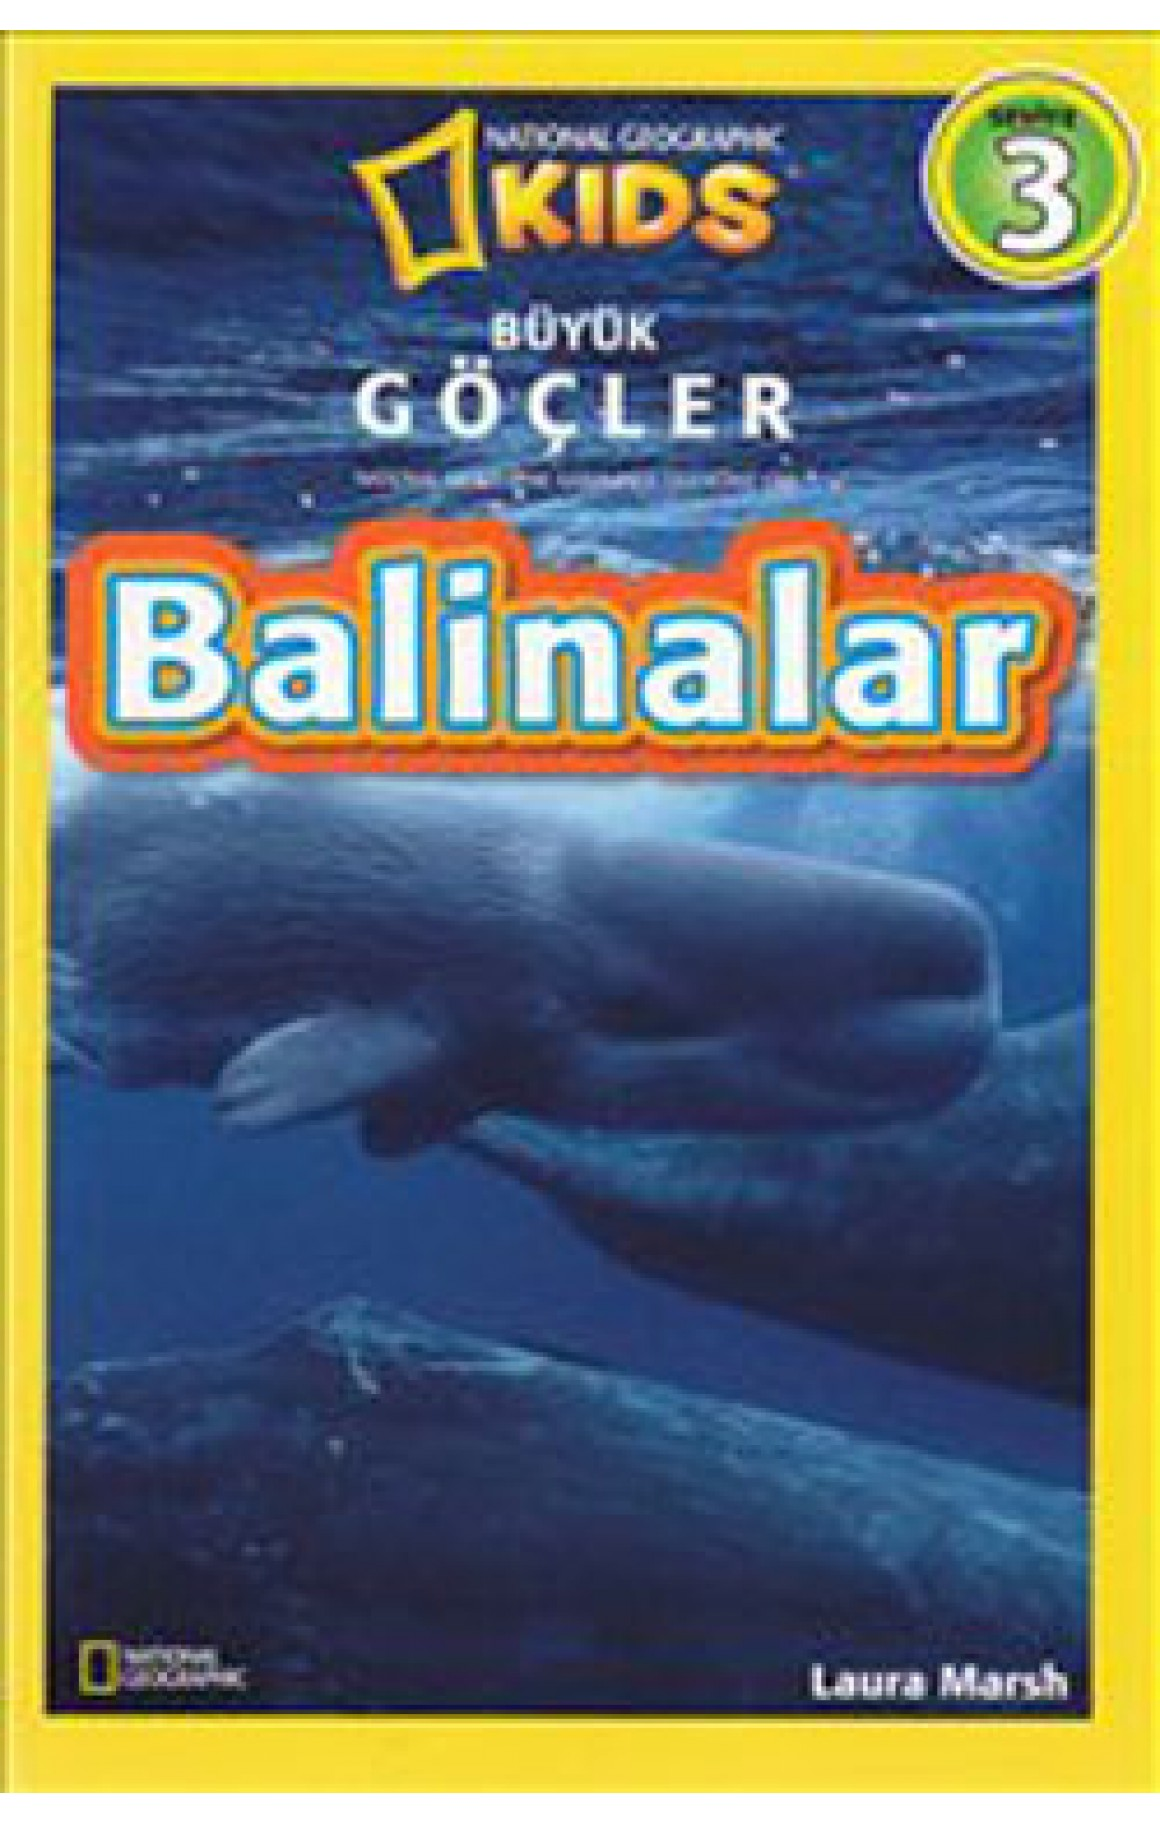 National Geographic Kids - Balinalar